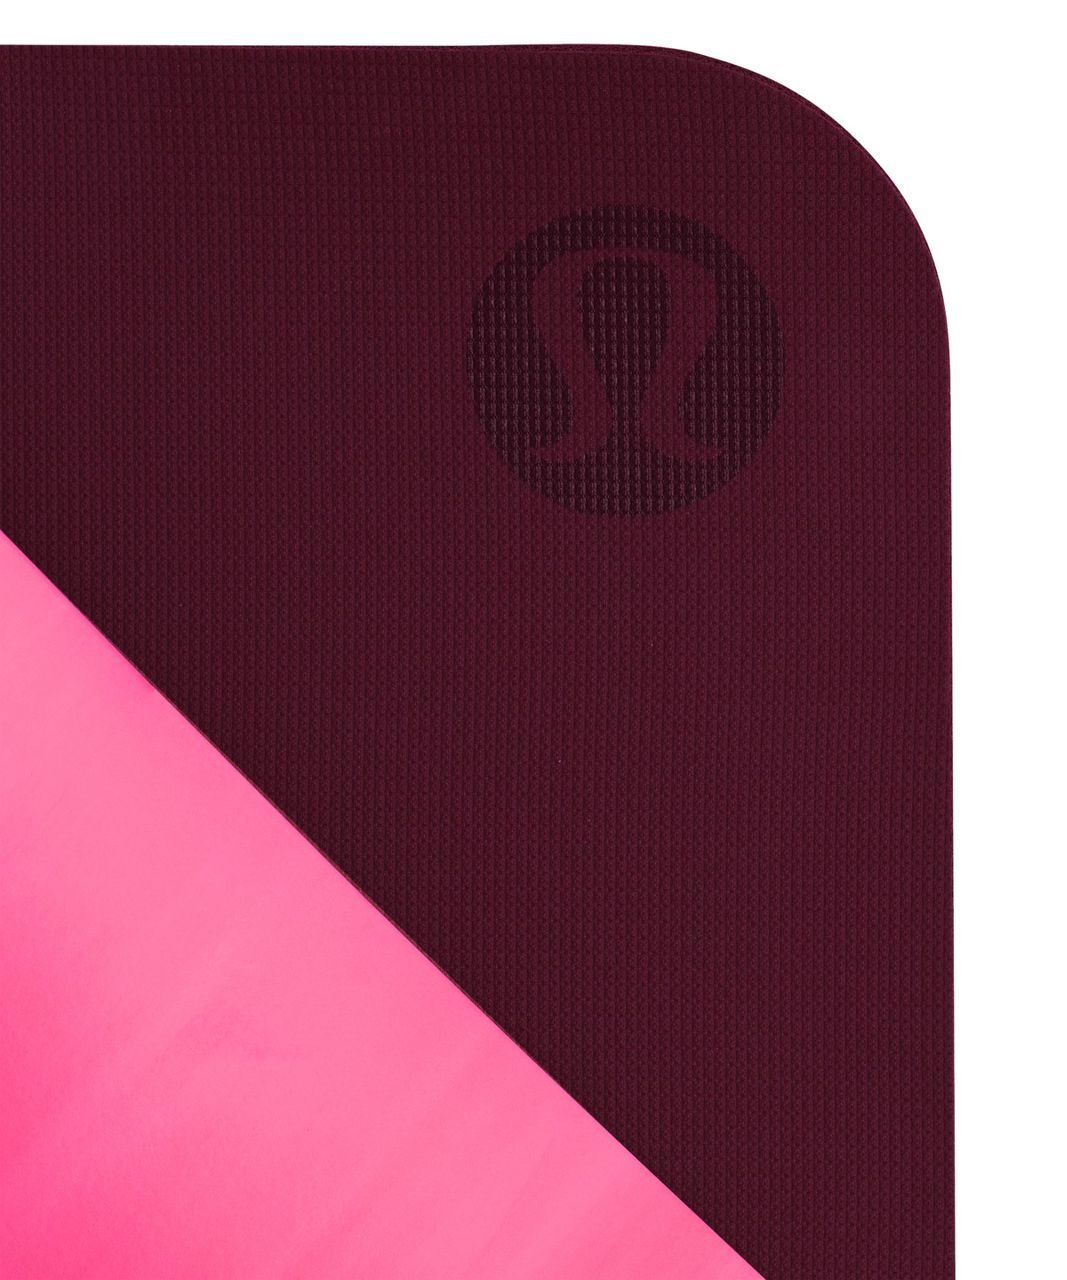 Lululemon The Reversible Mat 5mm - Jewelled Magenta / White / Dashing Purple